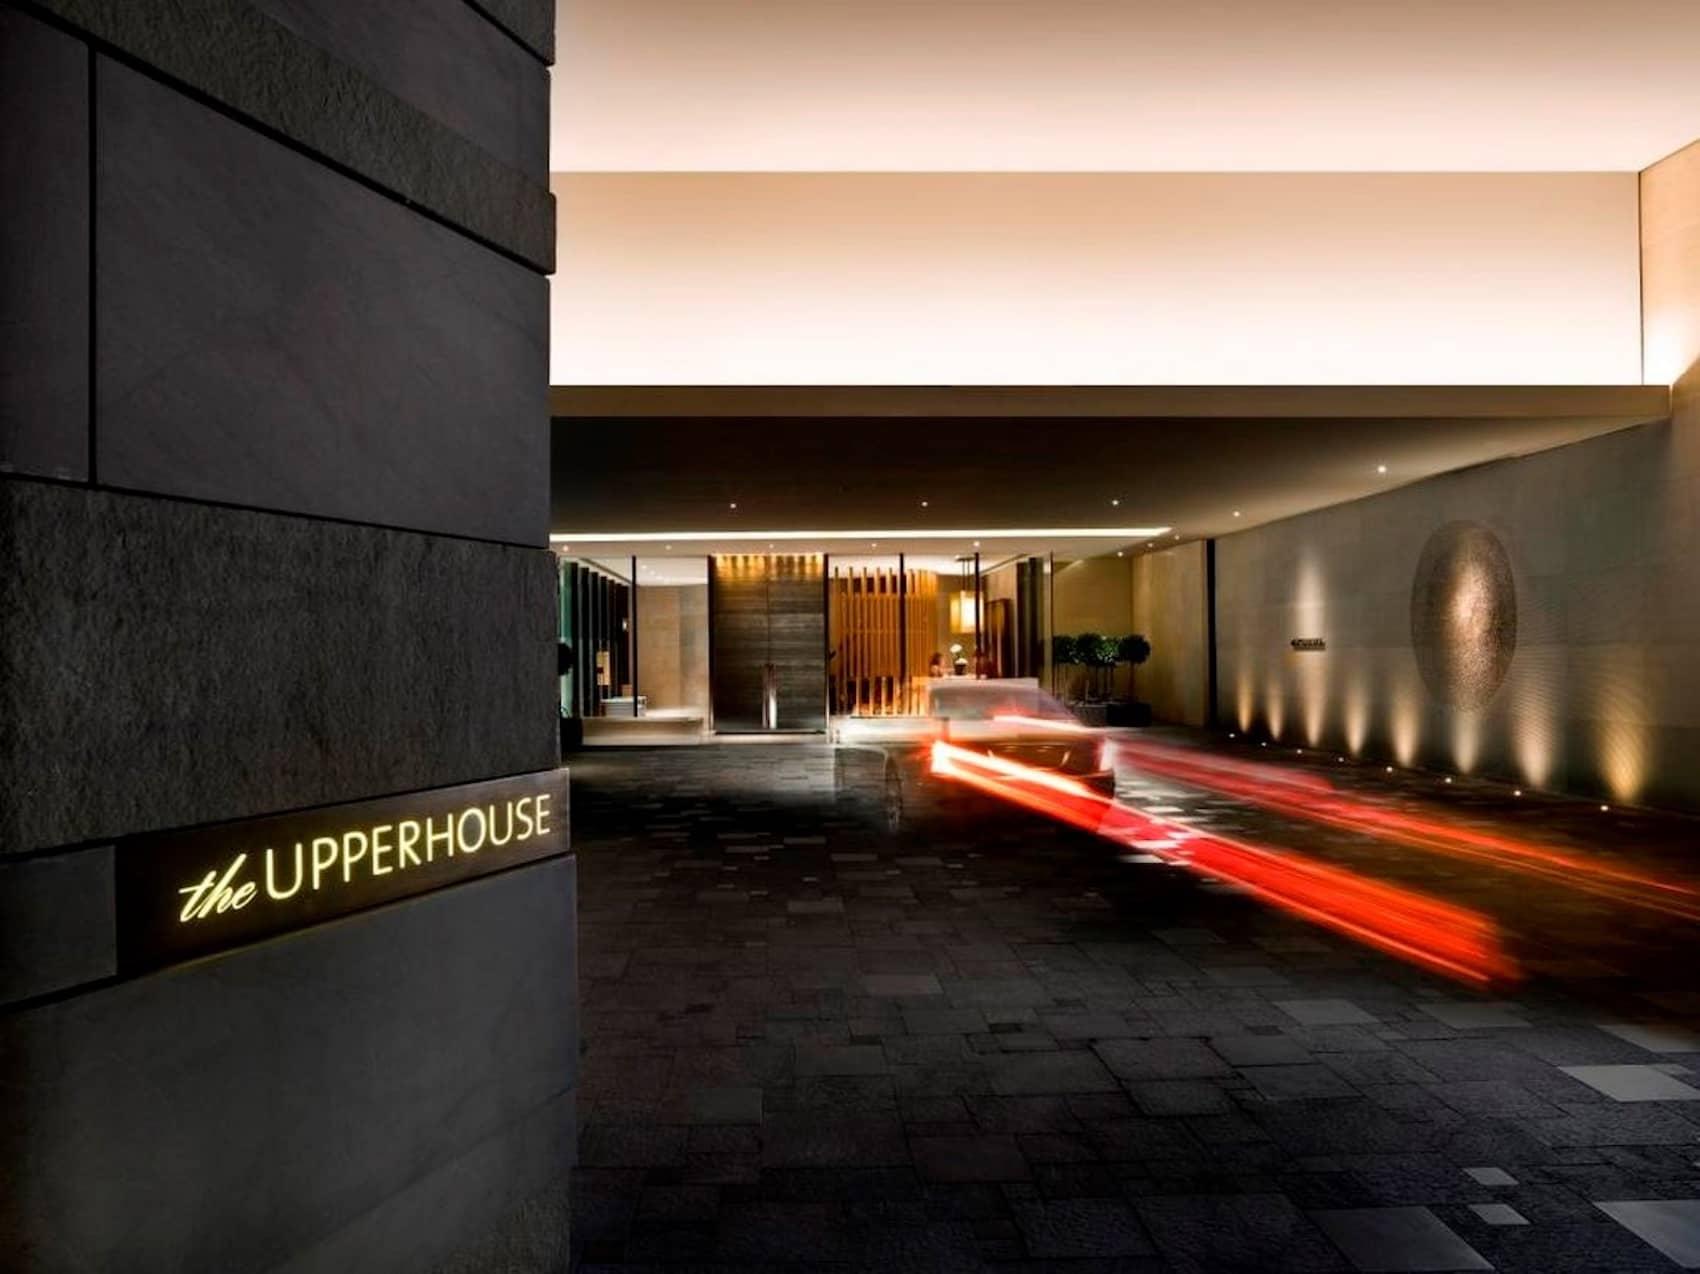 The upper house honk kong - viaggi di nozze tecnologici